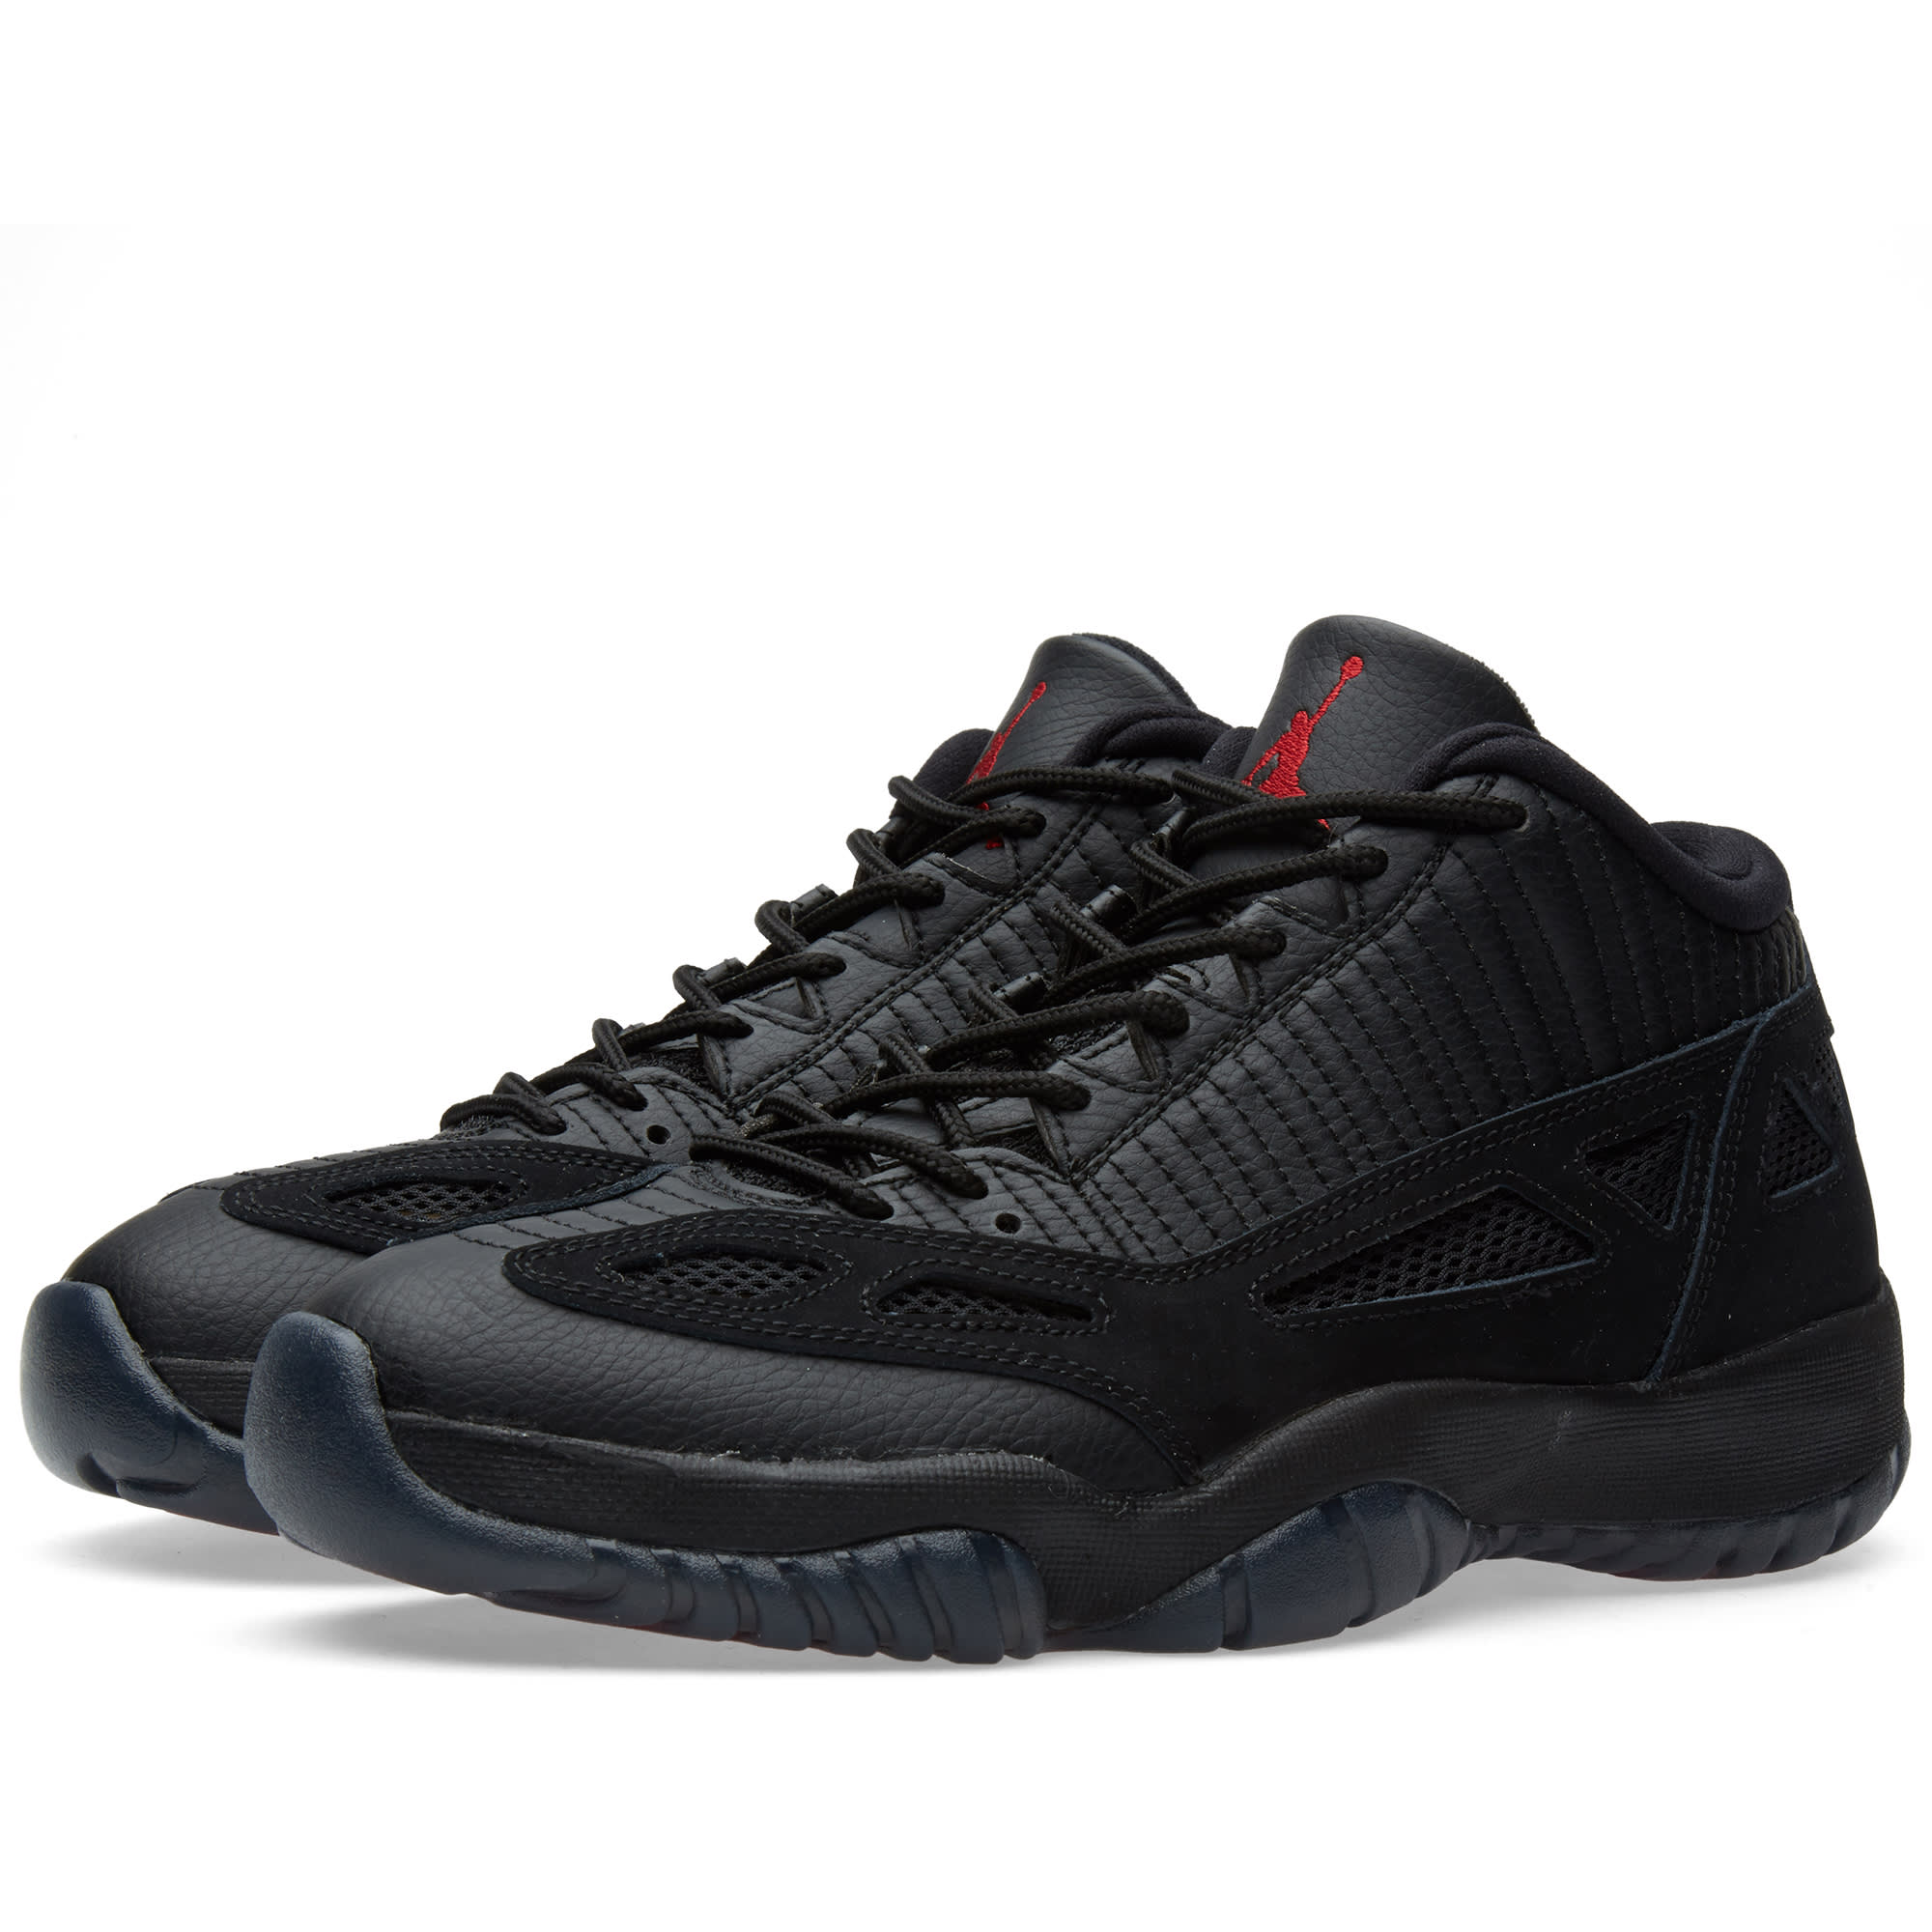 wholesale dealer 0afed e39c6 Nike Air Jordan XI Retro Low  Black Cat  Black   True Red   END.